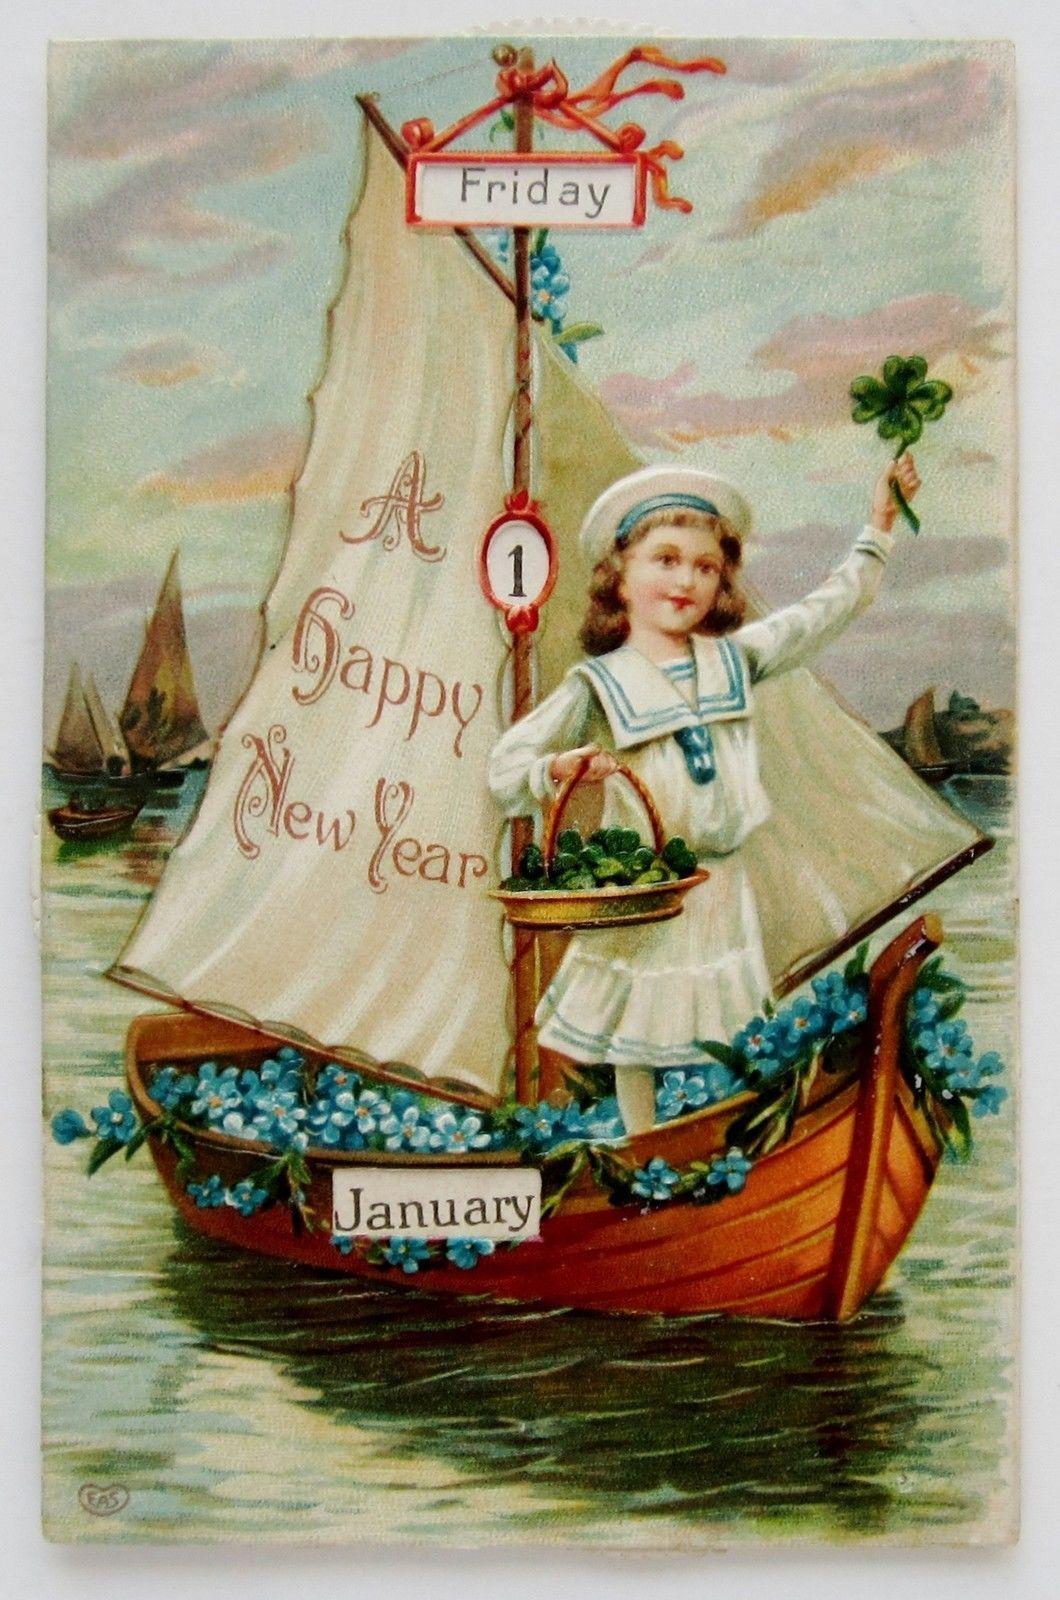 New Year Beautiful Mechanical Eas Postcard Girl In Sailboat Emb New Year Postcard Postcard Vintage Postcards